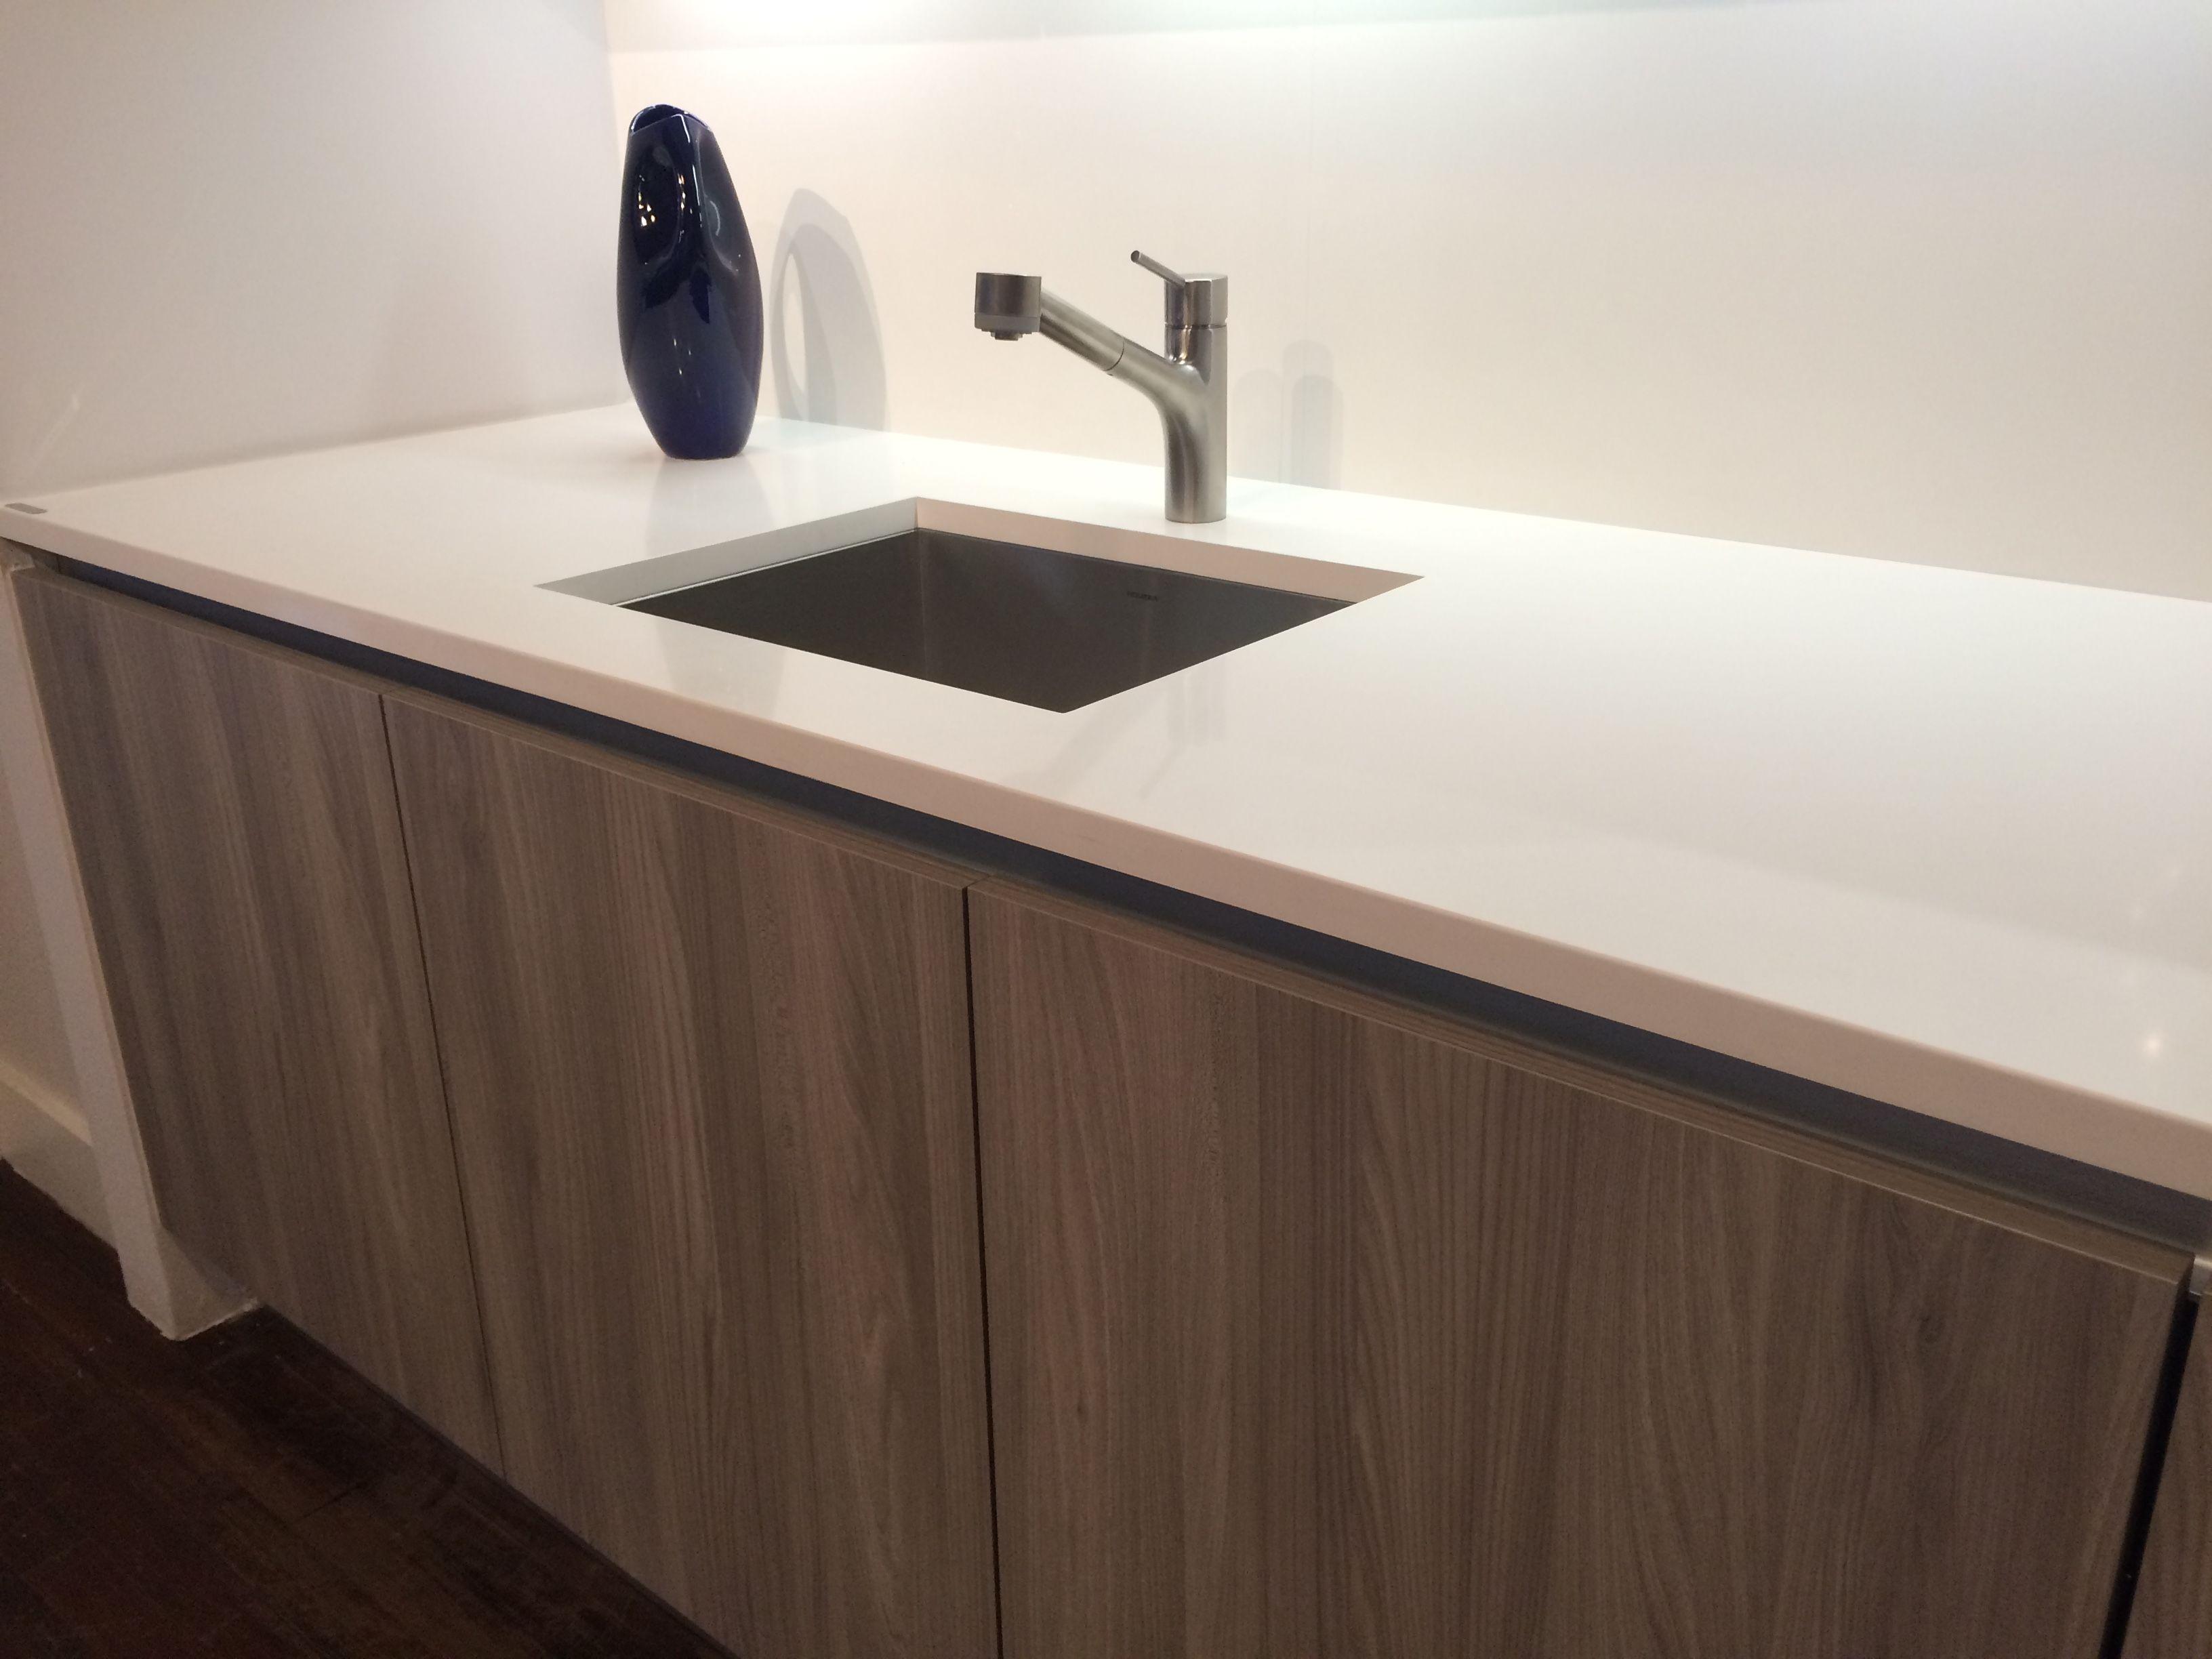 Cesar cabinets - grey oak - at Manhattan Center for Kitchen & Bath ...